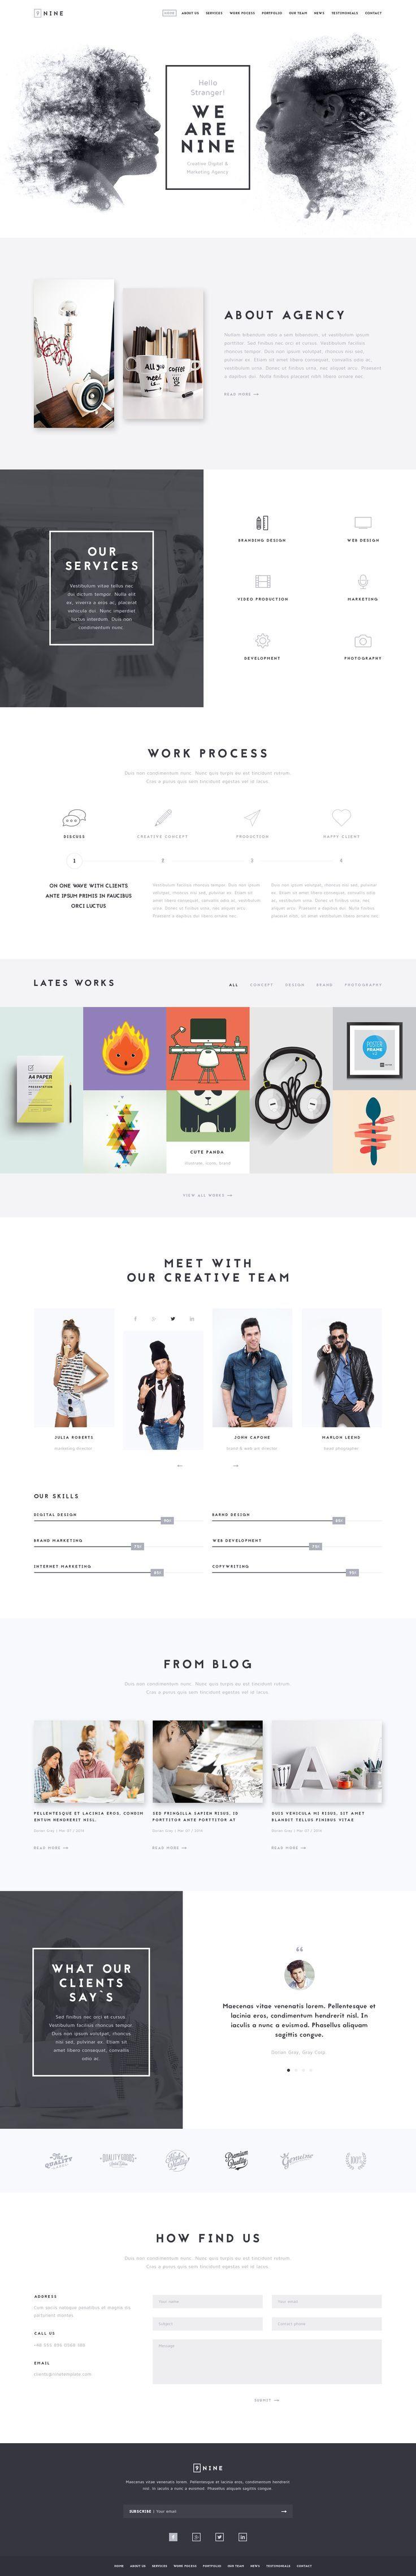 53 Best Minimal Simple Wordpress Themes 2020 Web Layout Design Web Design Creative Website Design